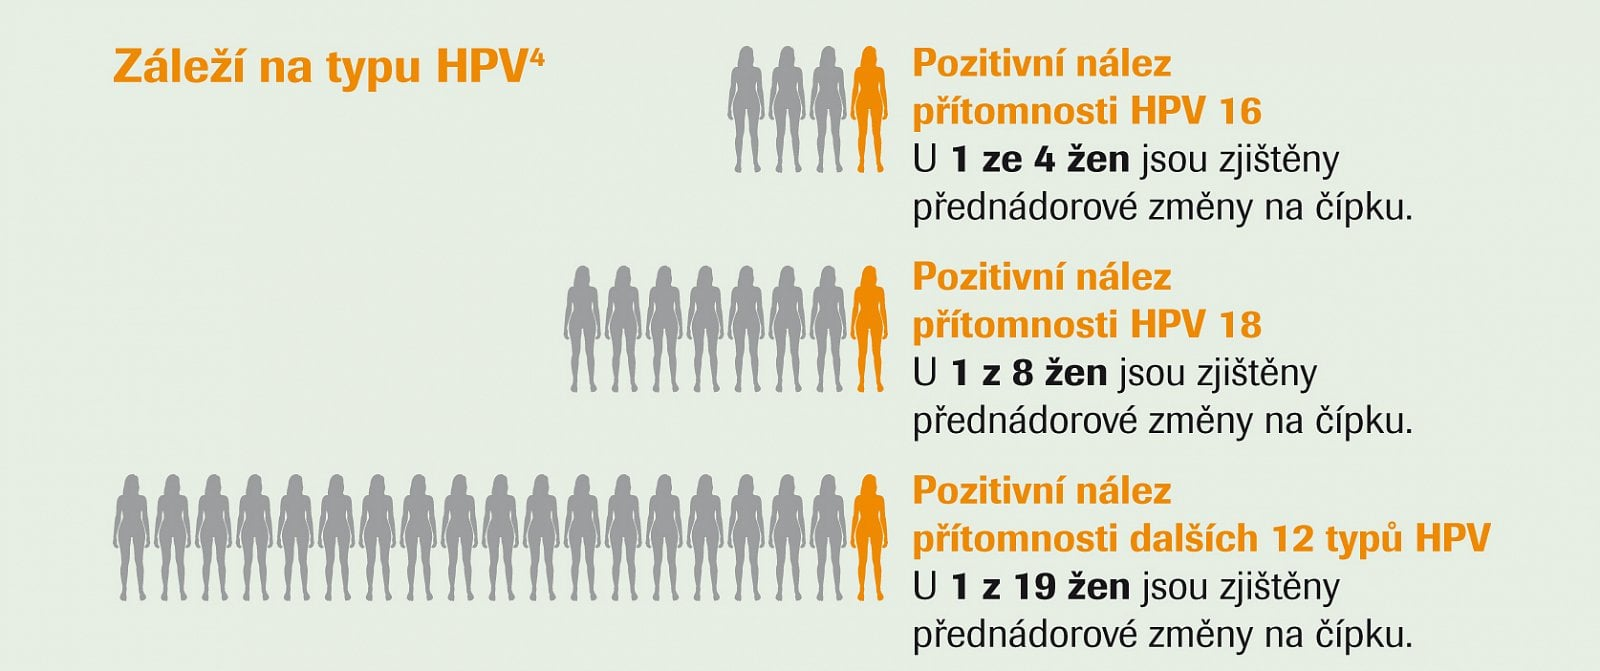 hpv vírus lecba u zen)